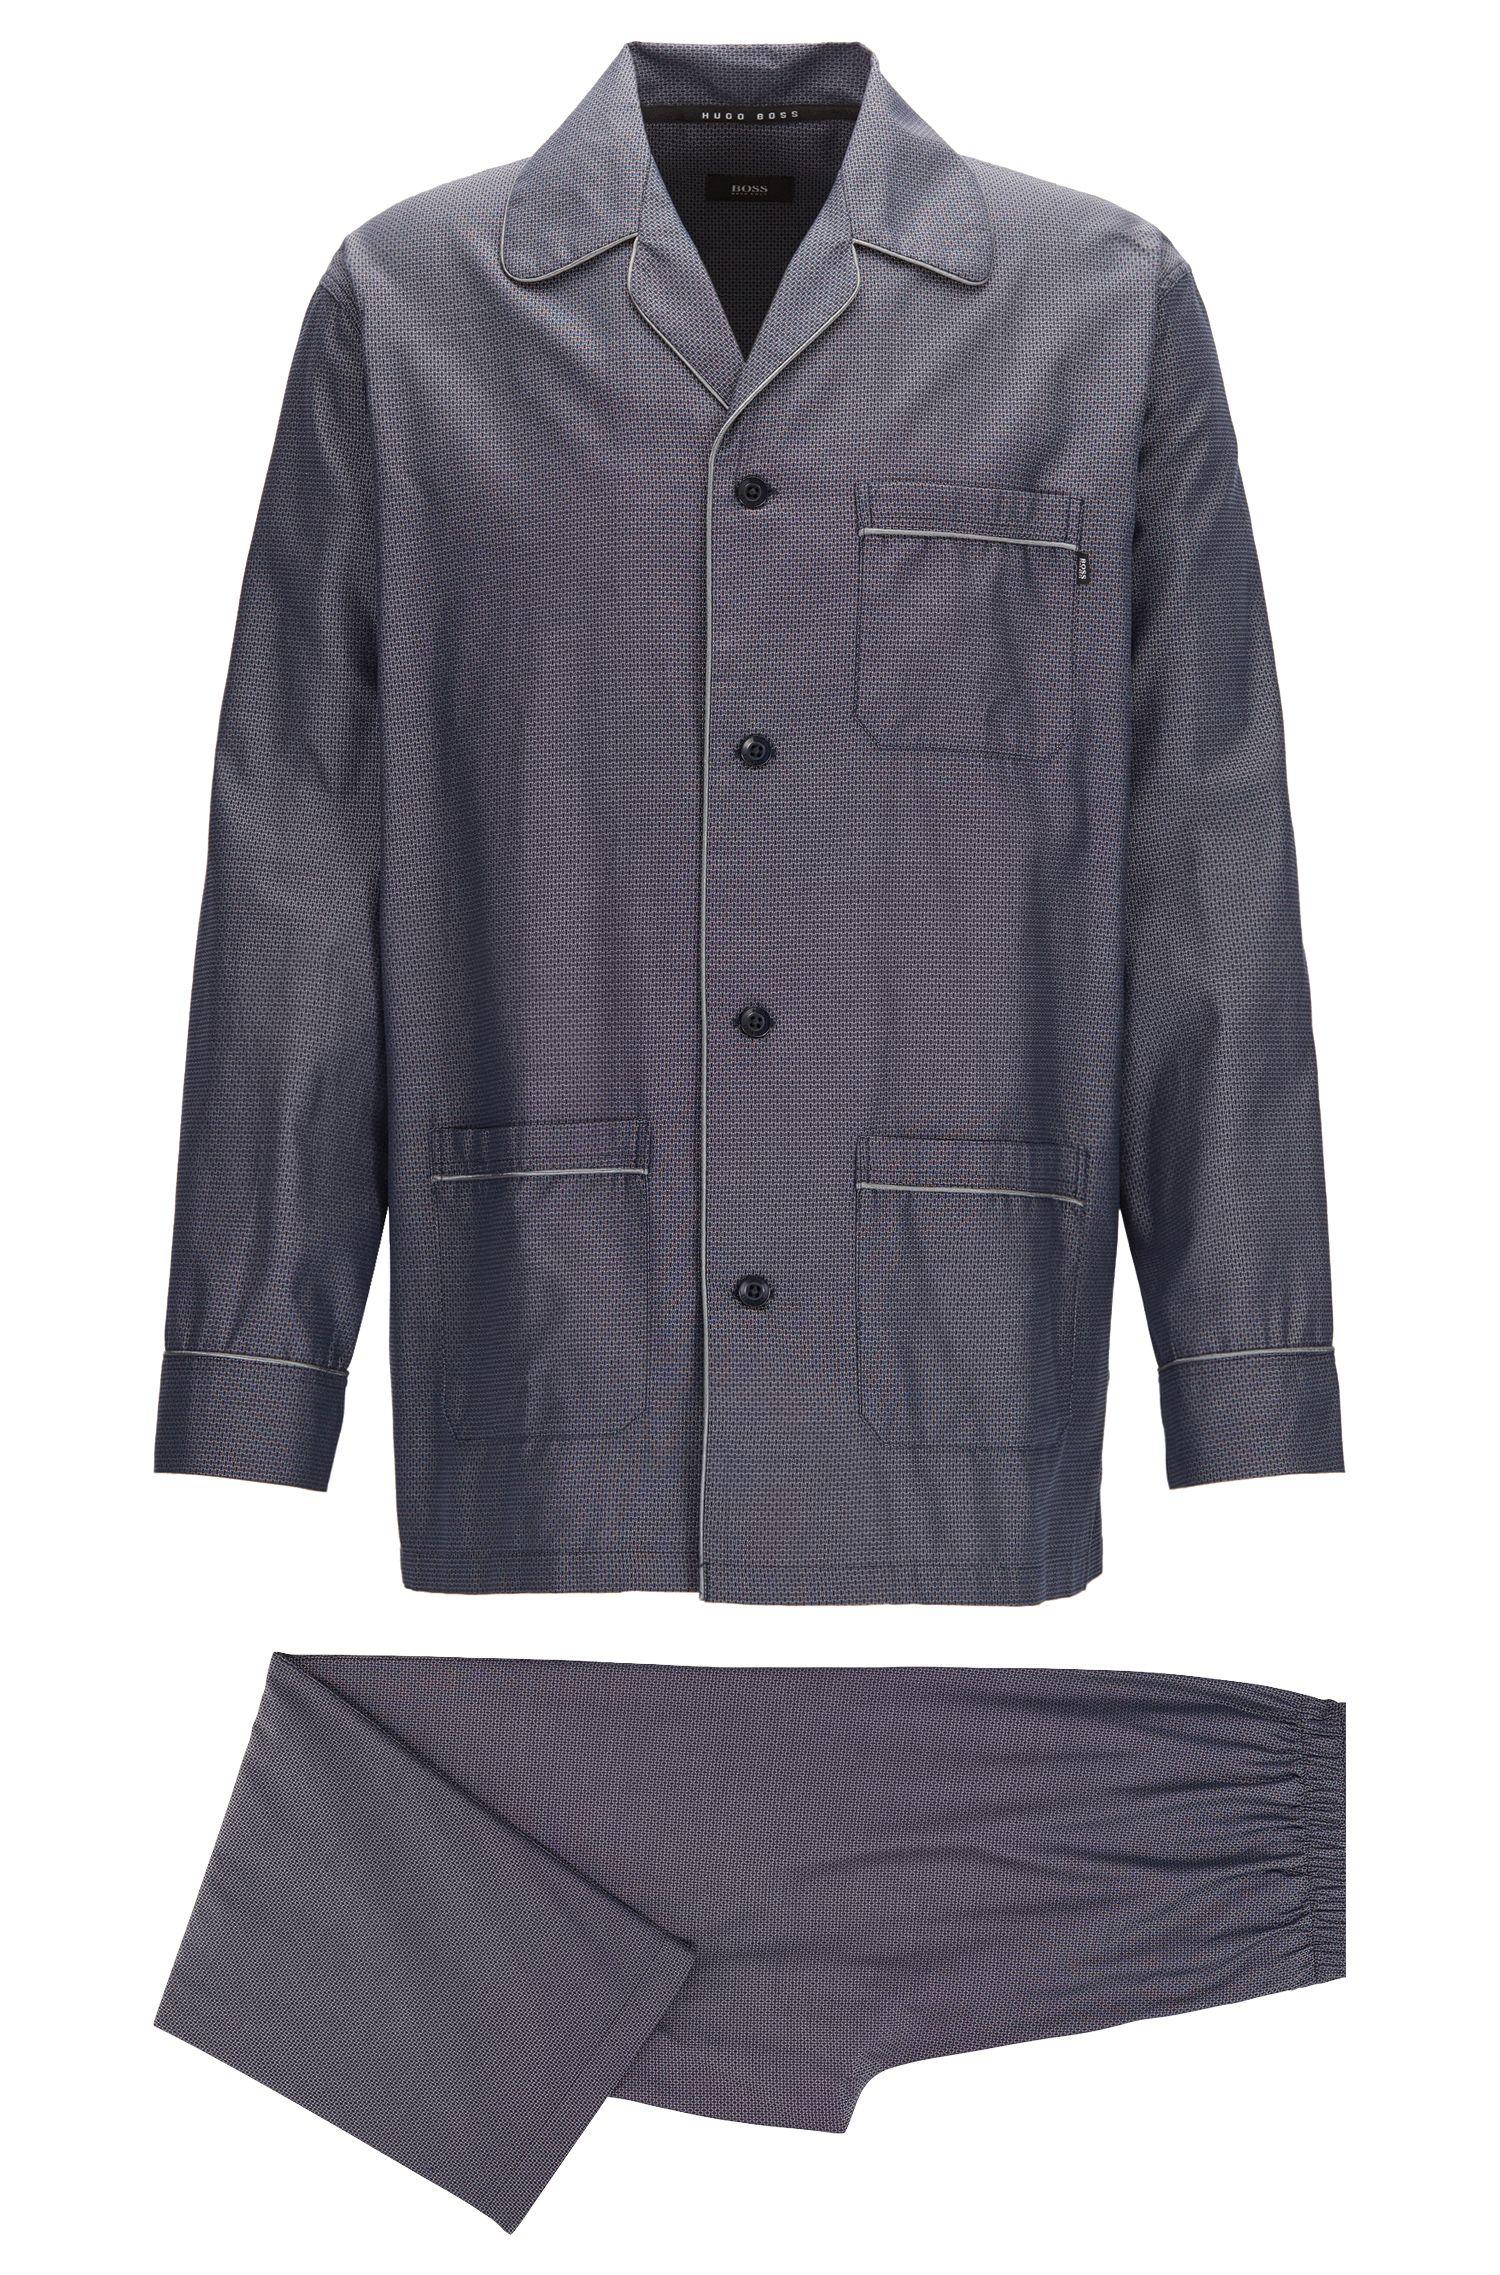 Pyjama set in lightweight cotton jacquard